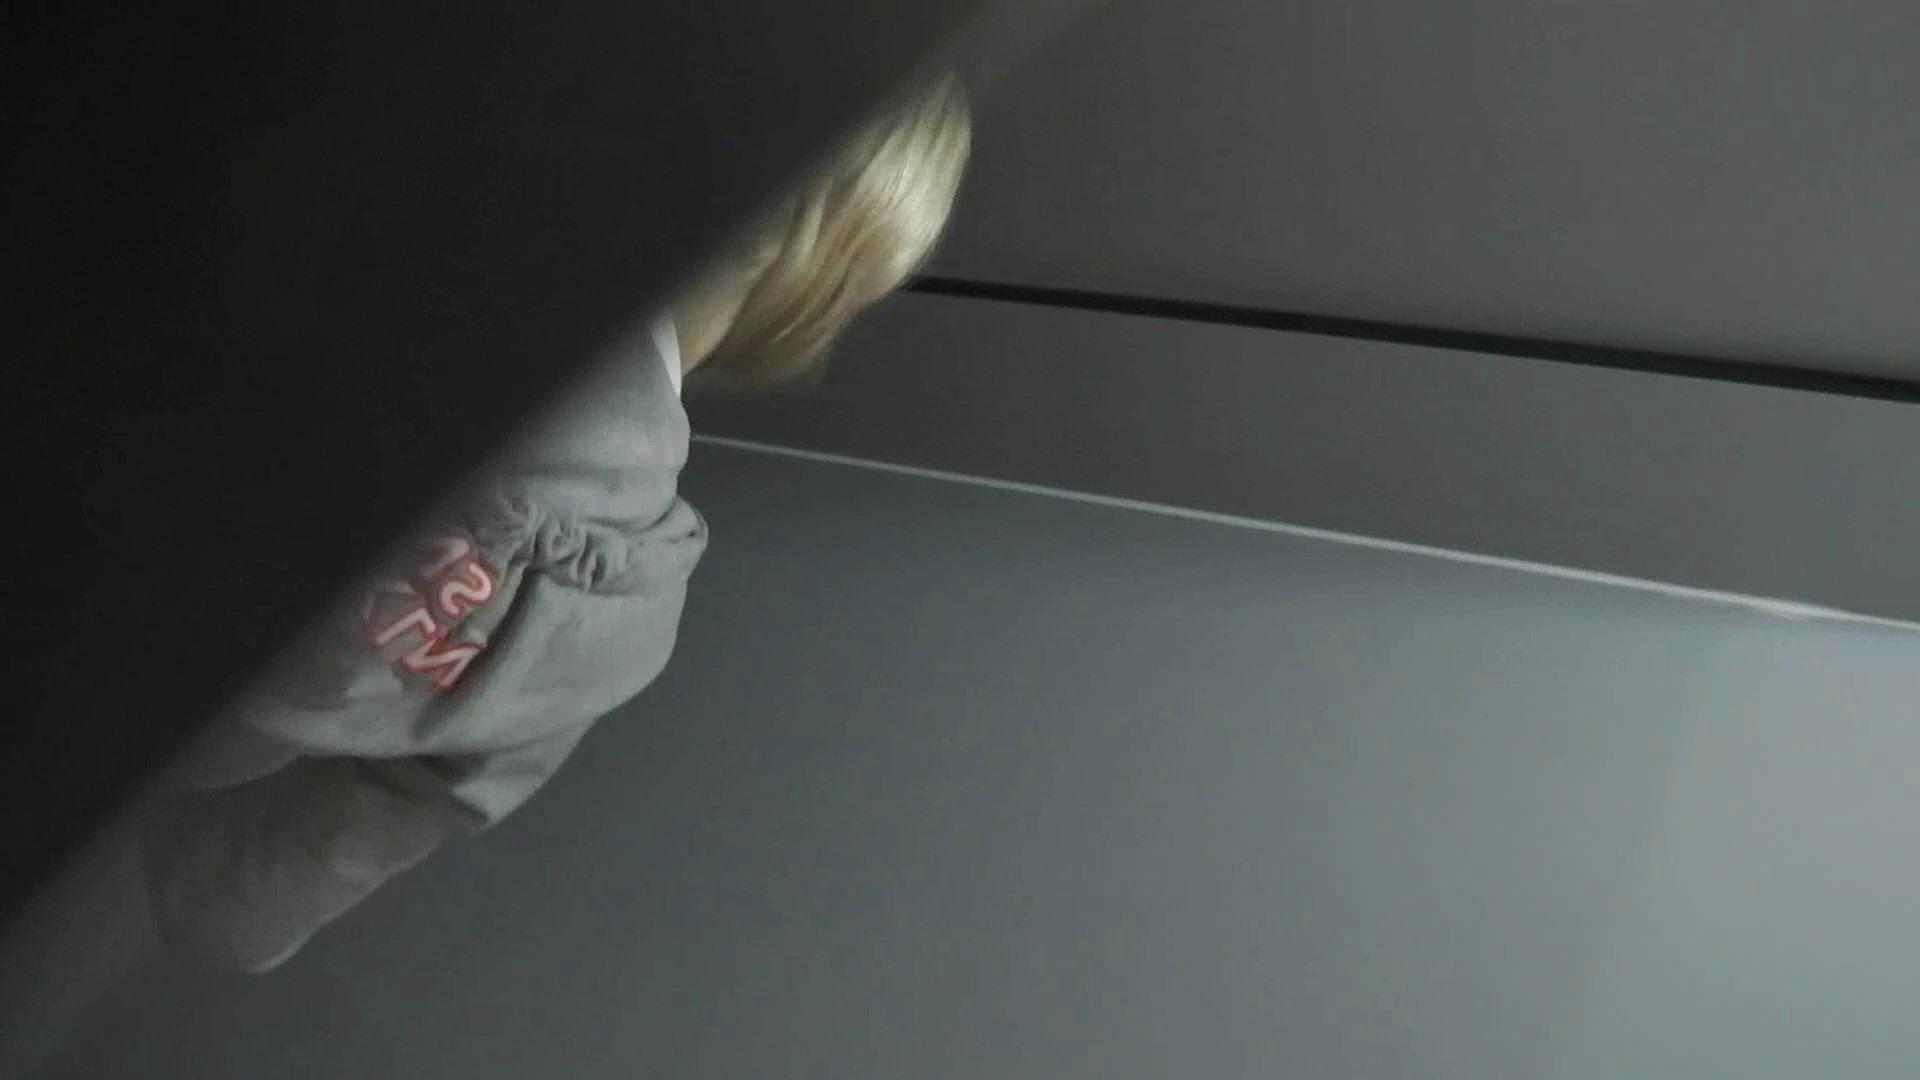 vol.25三十時間潜り、一つしか出会えない完璧桃尻編 byお銀 美人  96pic 33